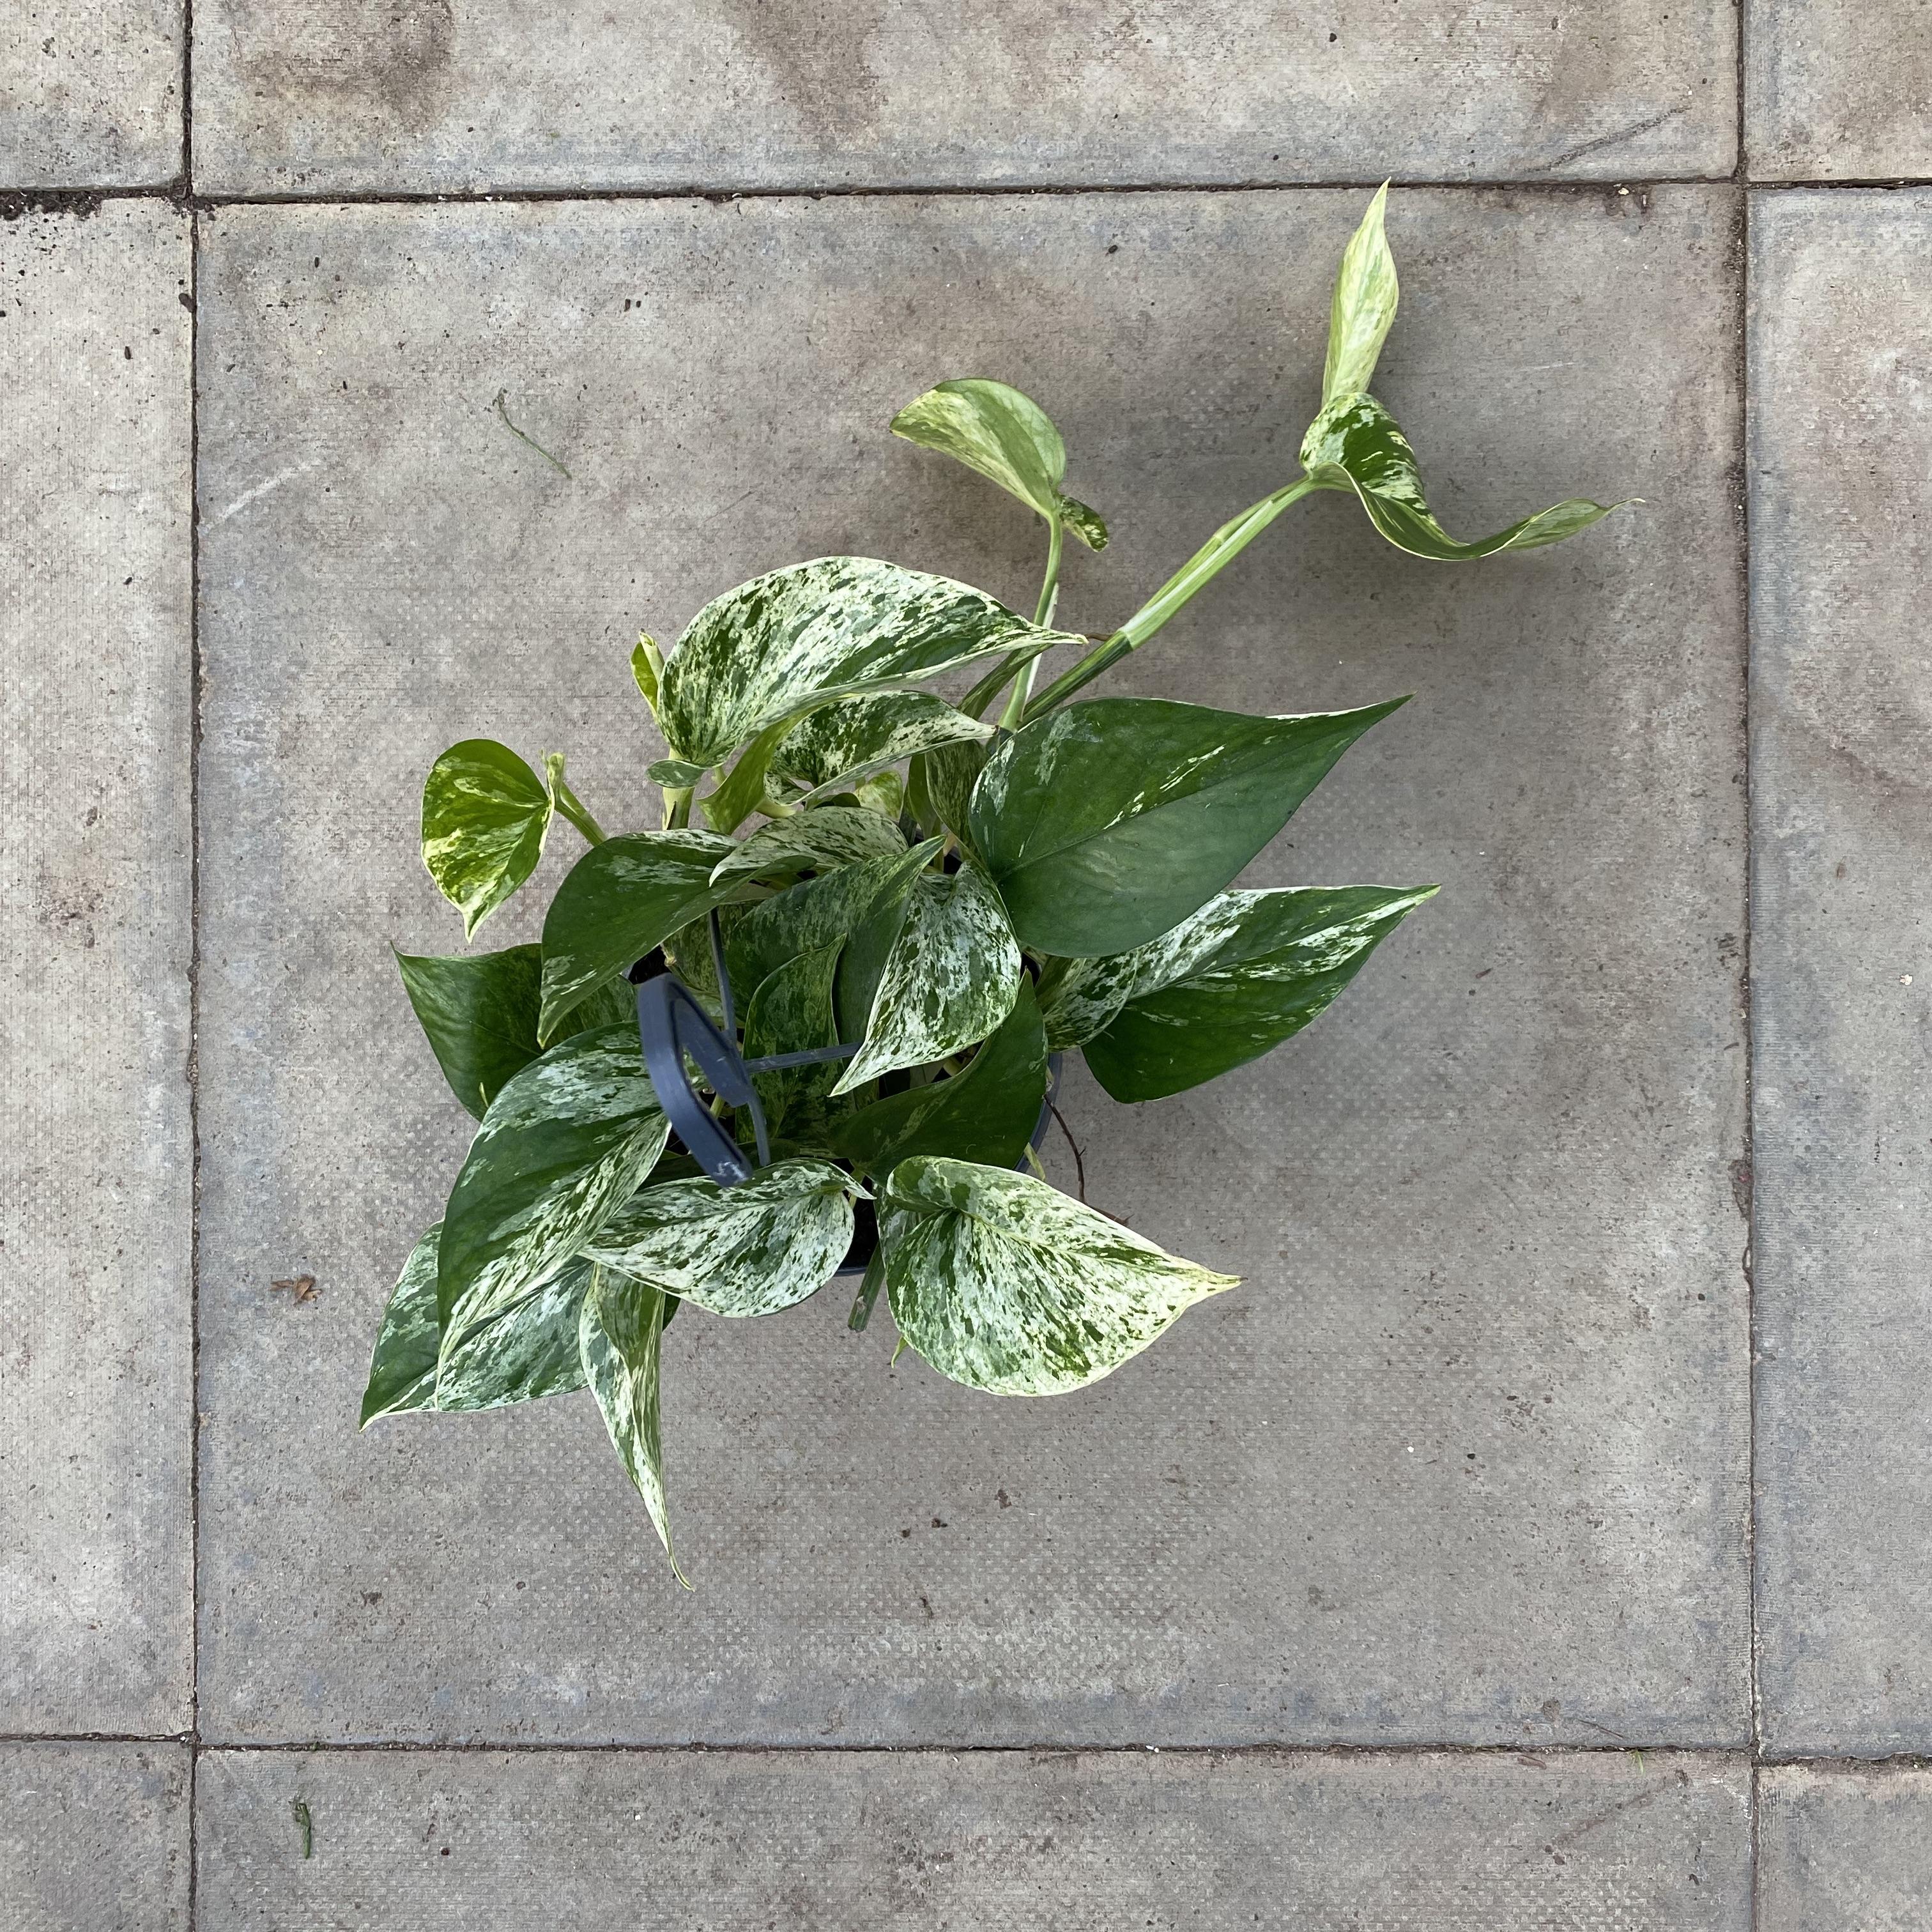 Epipremnum pinnatum 'Marble Queen' (Marble Queen Pothos)